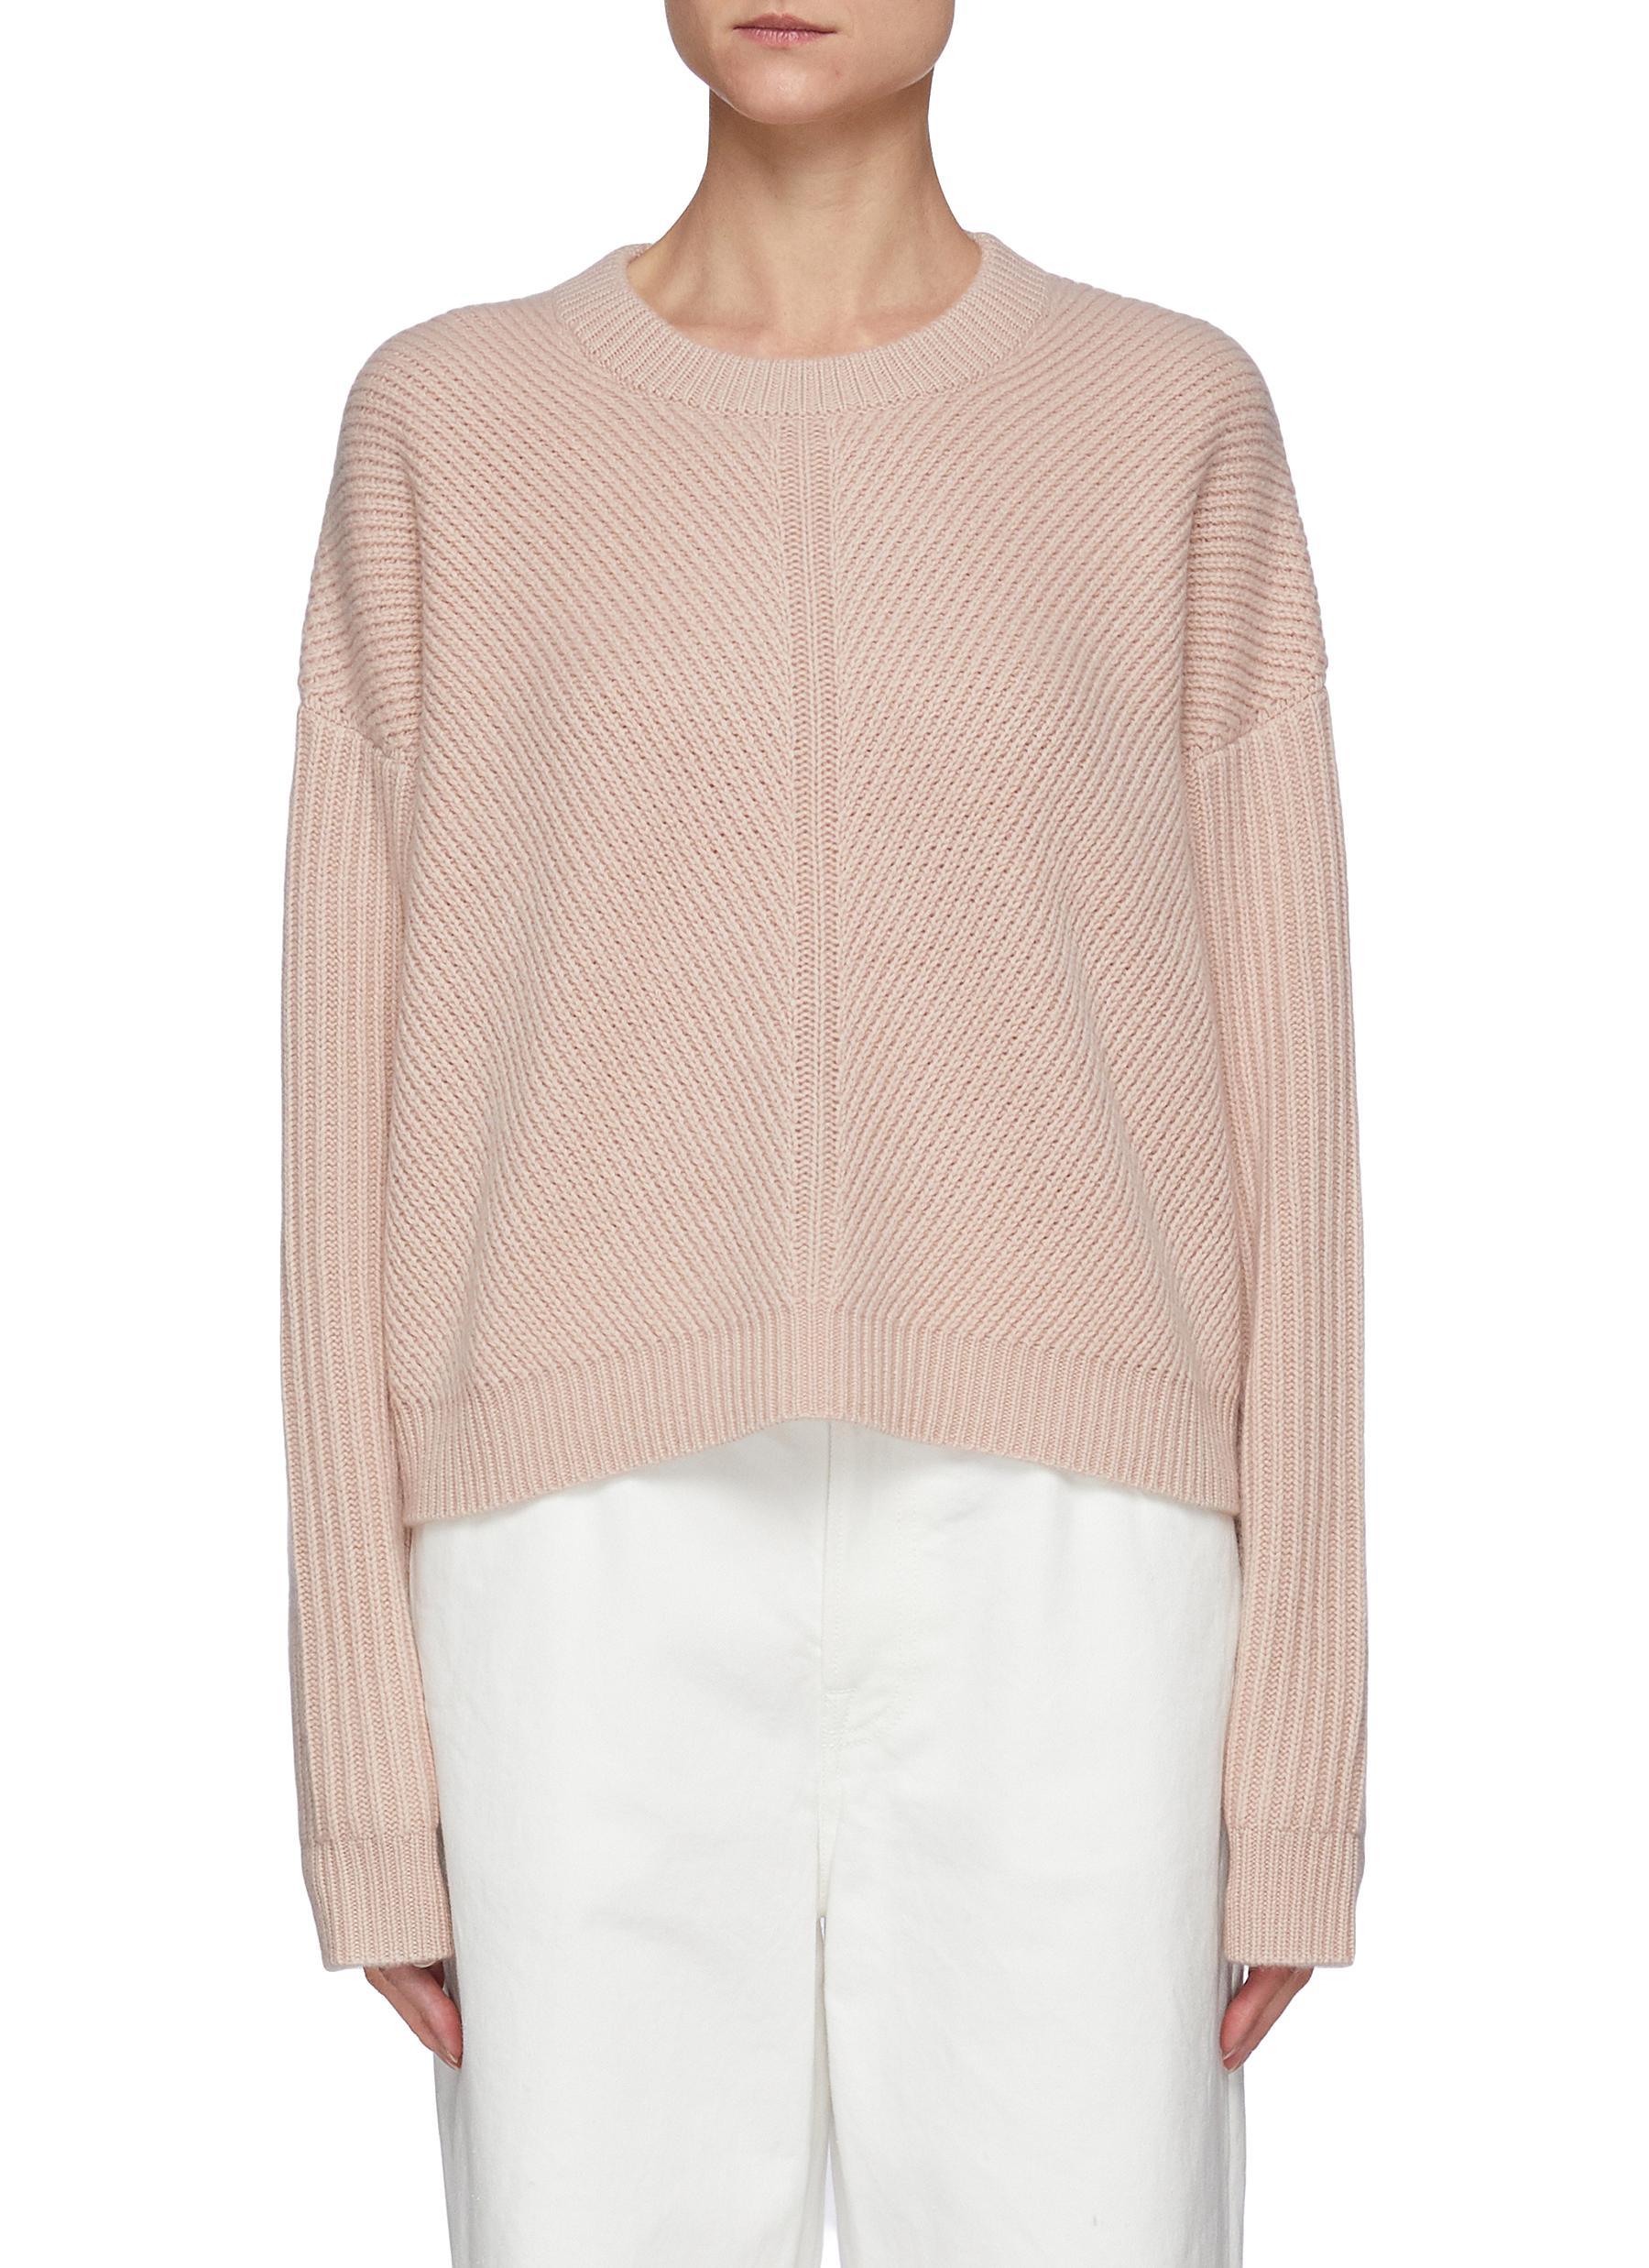 Puglia' Round Neck Sweater